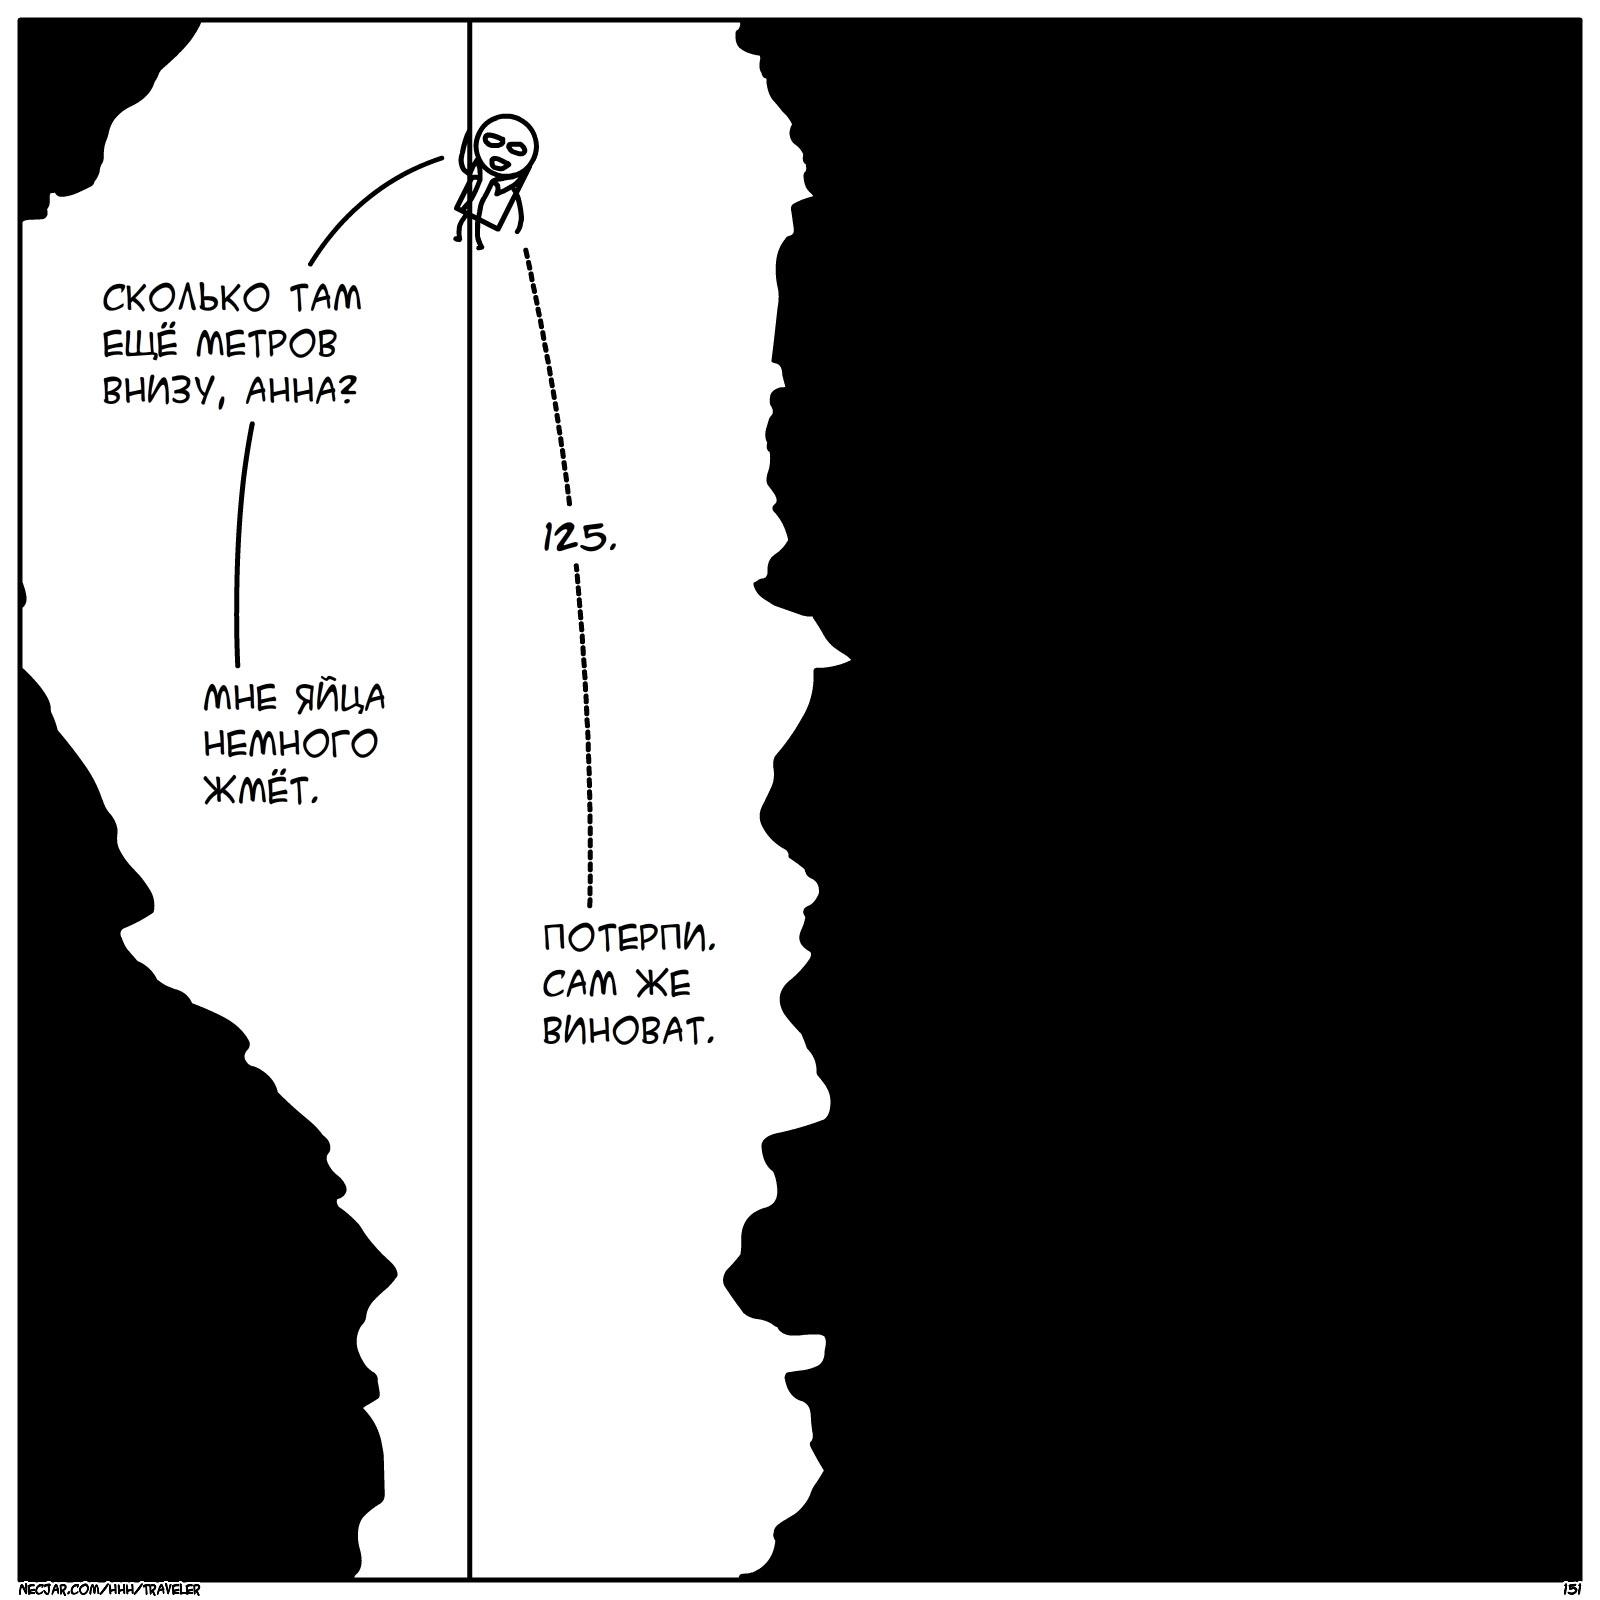 Head Held High: Traveler, Travis, Traveler, comics, HHH, Head Held High, Head Held High: Traveler, Высоко Поднятая Голова